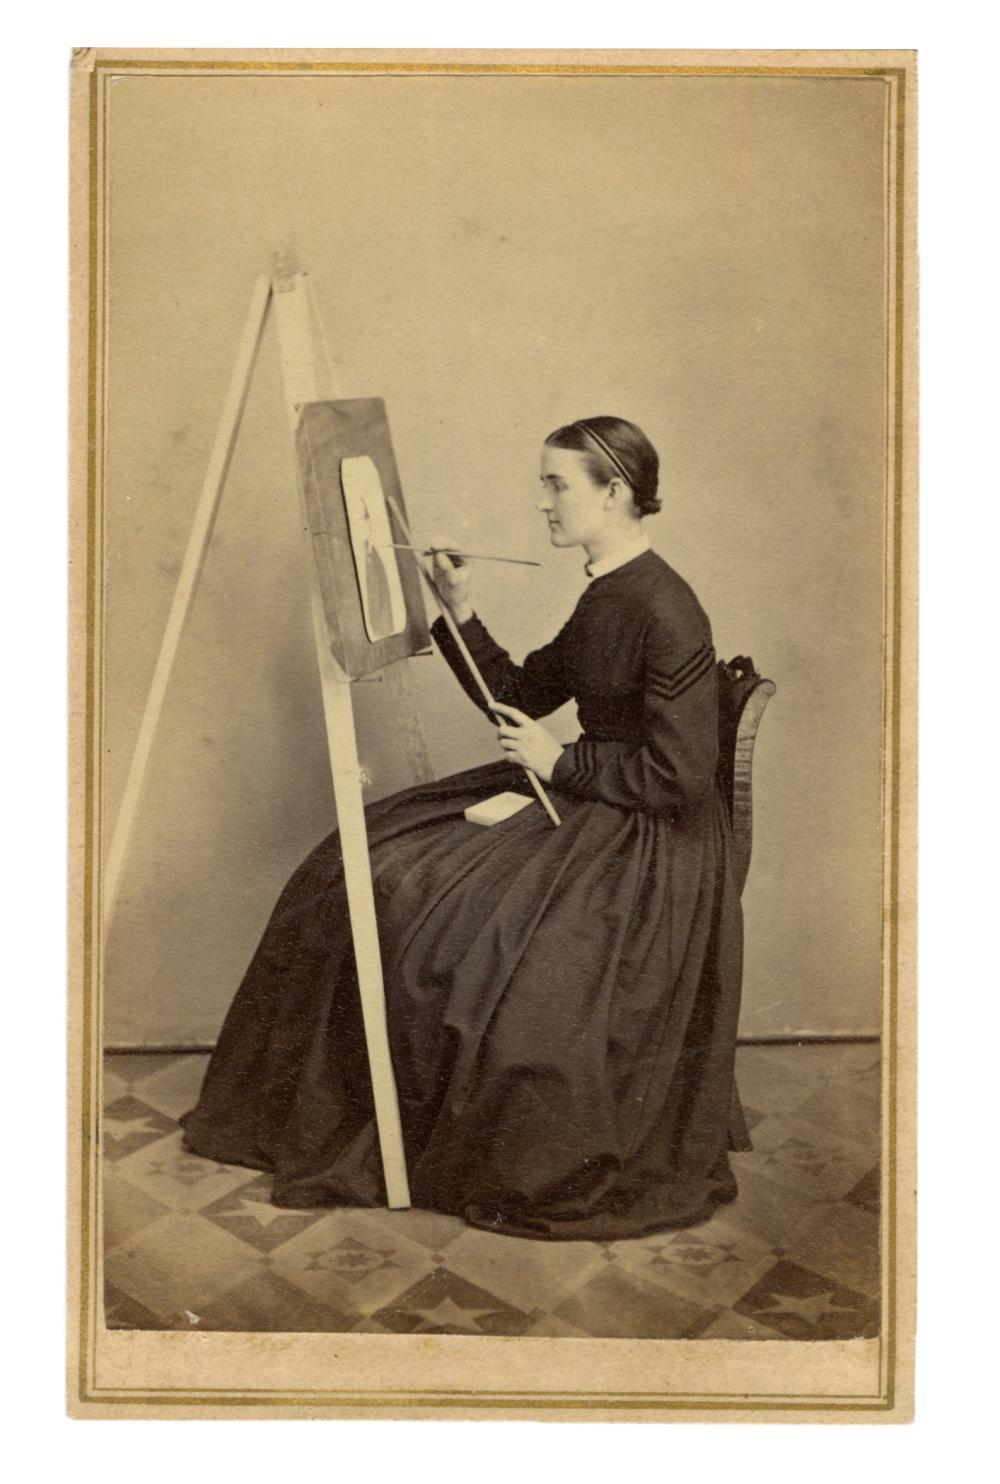 PORTRAIT OF A YOUNG ARTIST [CDV]